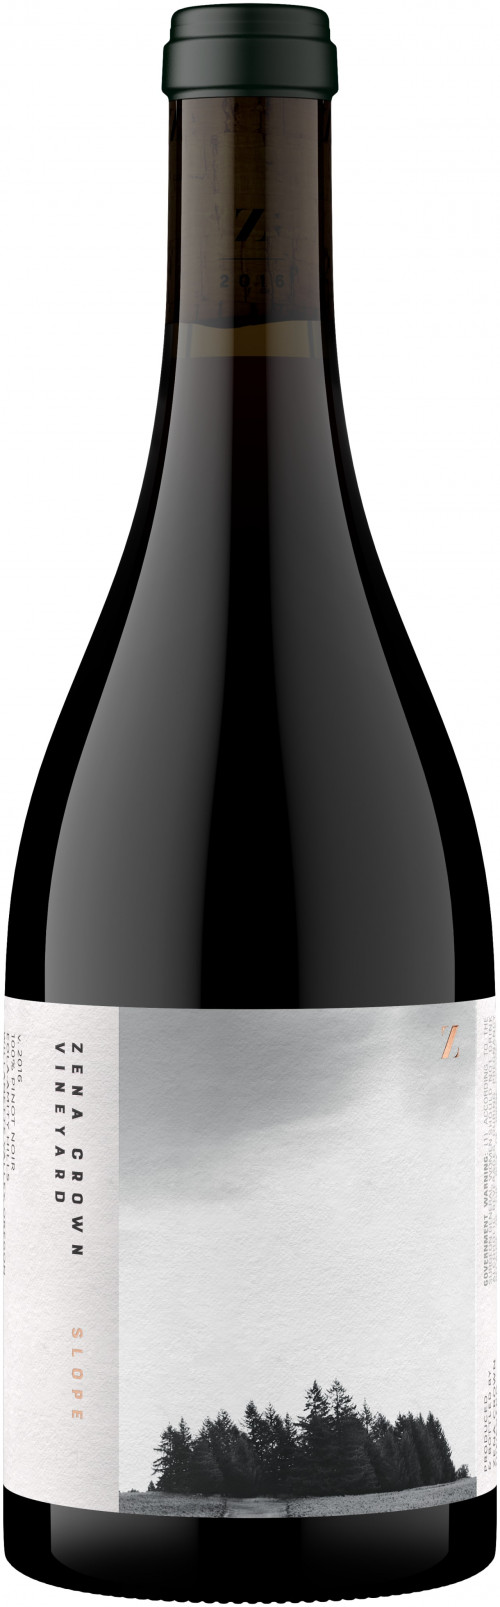 2016 Zena Crown The Slope Pinot Noir 750ml